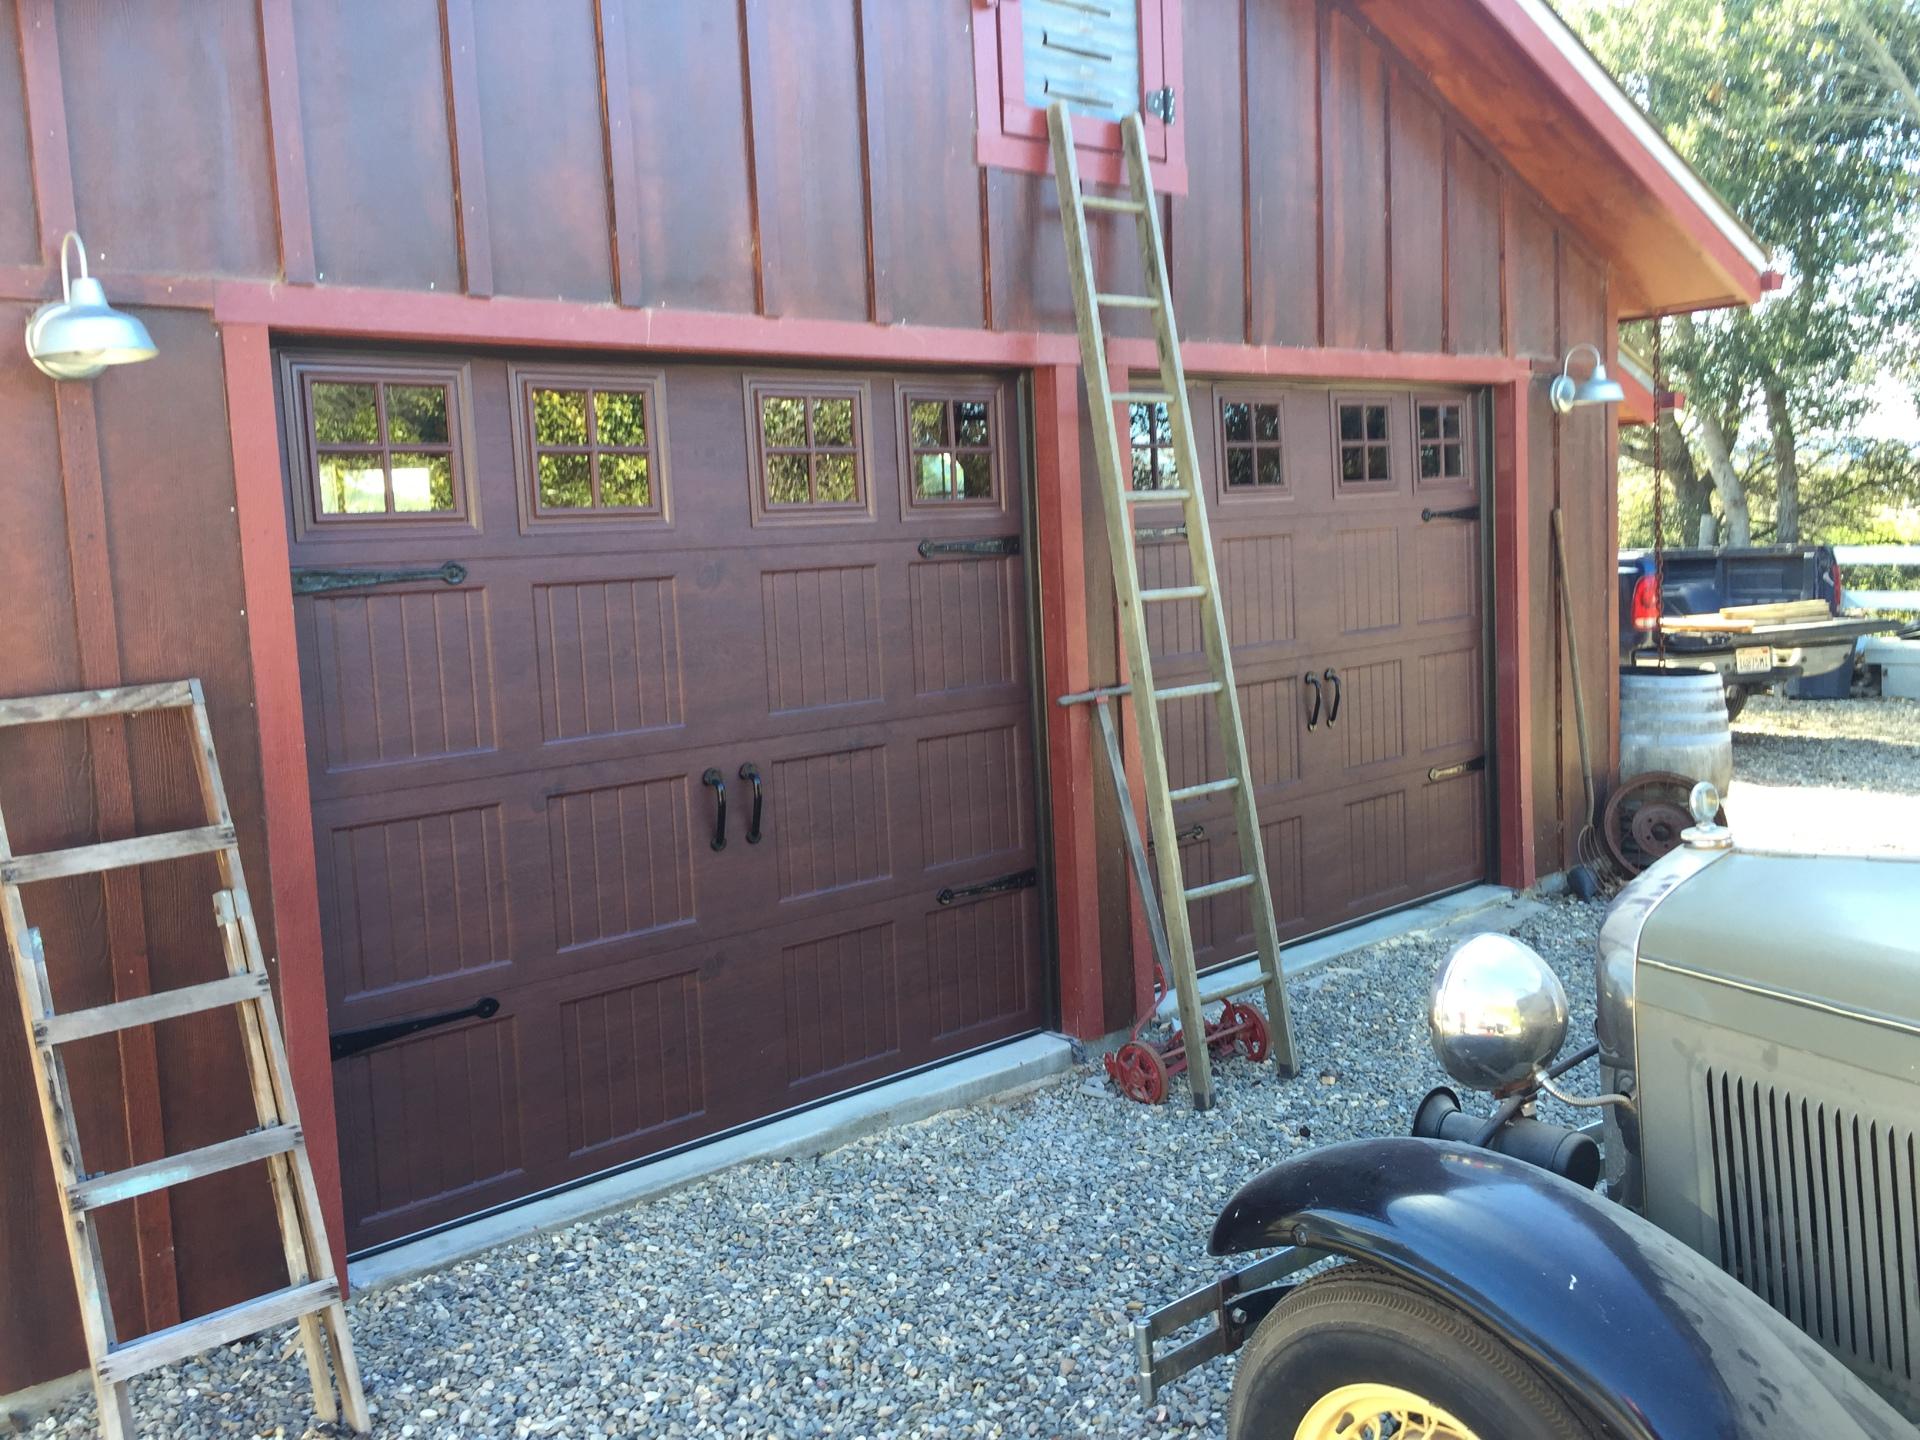 Unique Garage Door Insulated w/ Stockton windows, straps, and custom woodgrain color